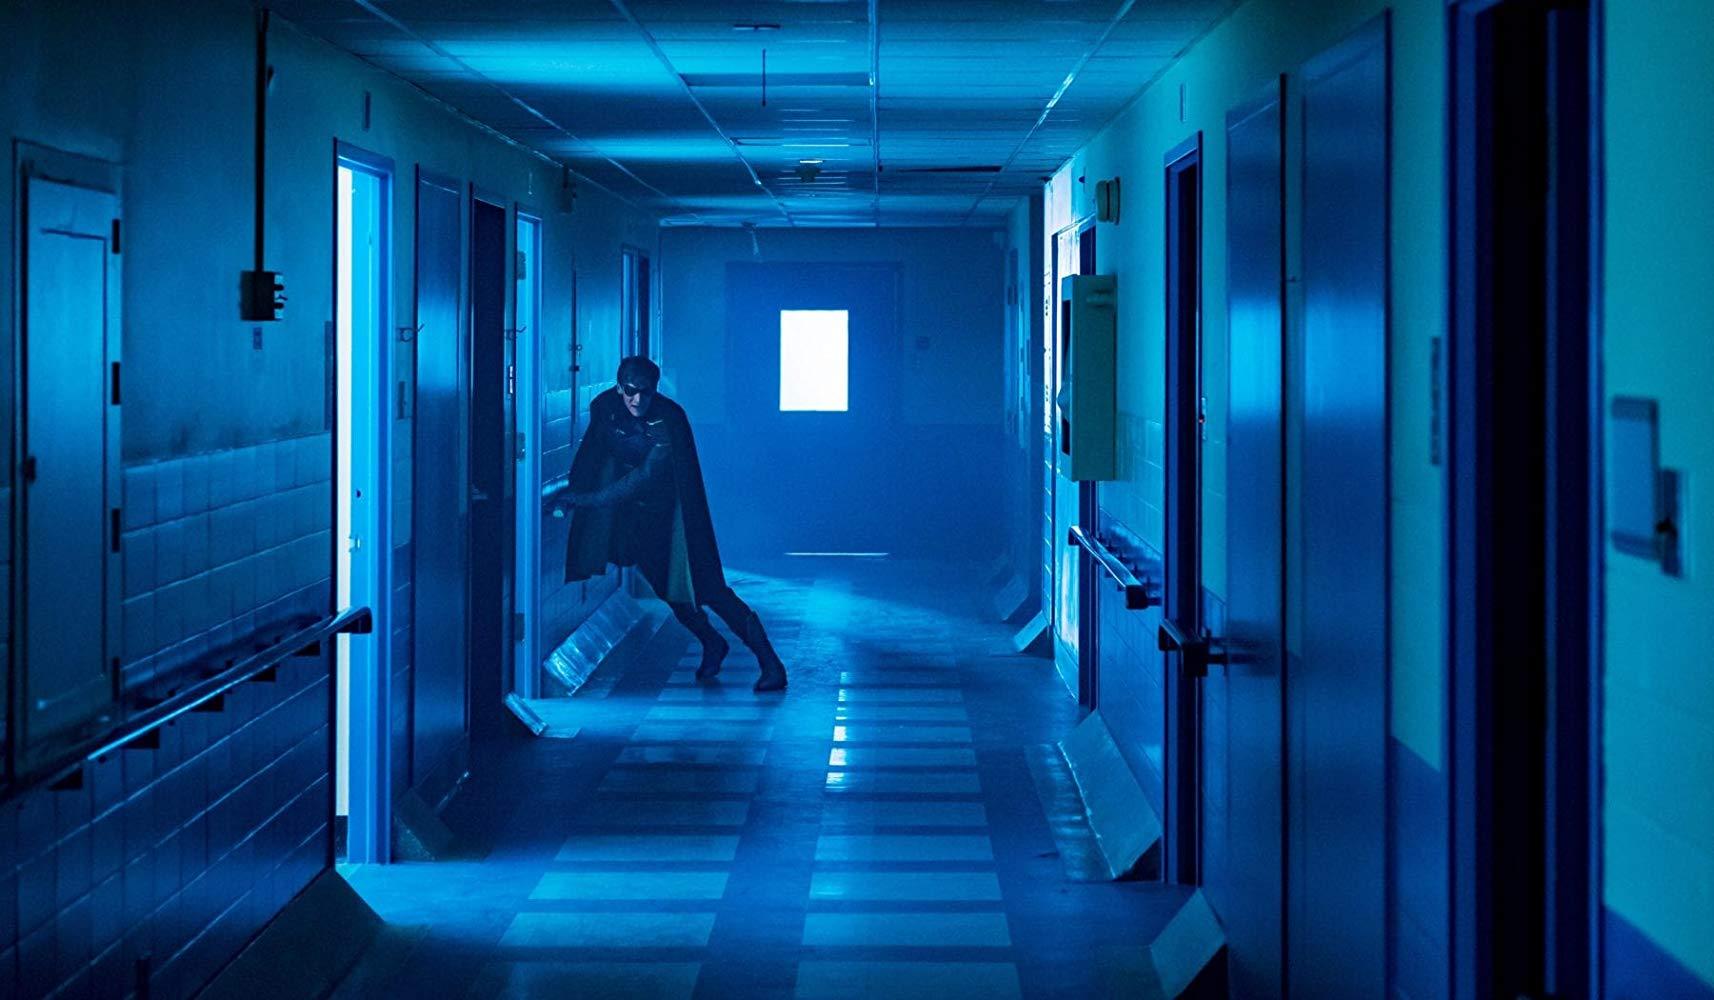 Titans (TV Series) Episode: Asylum